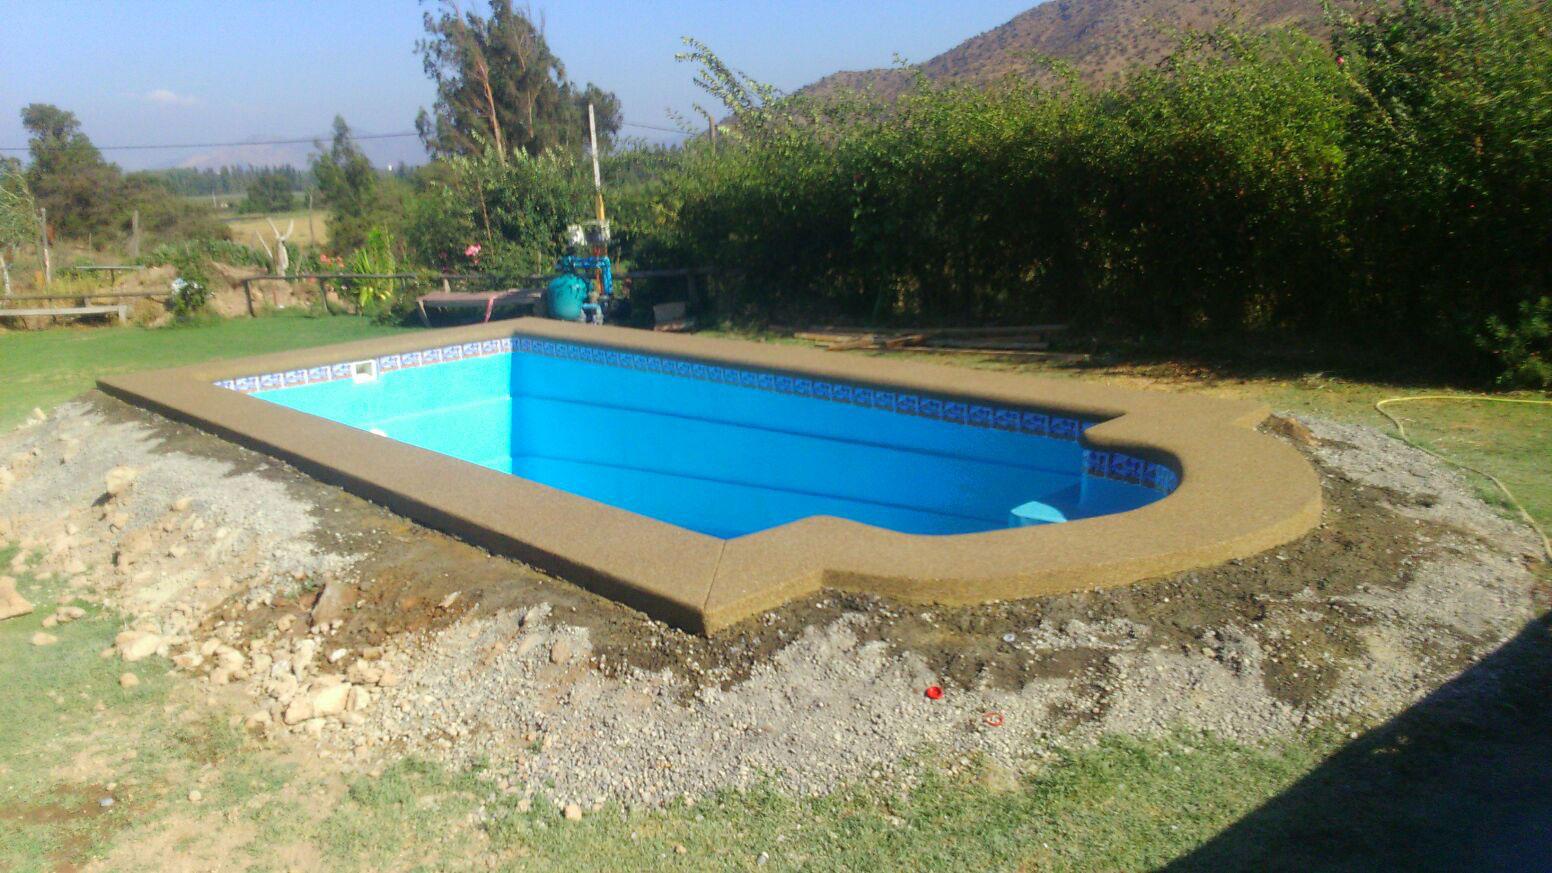 Piscinas de fibra de vidrio mejores precios instalacion y for Instalacion piscina precio